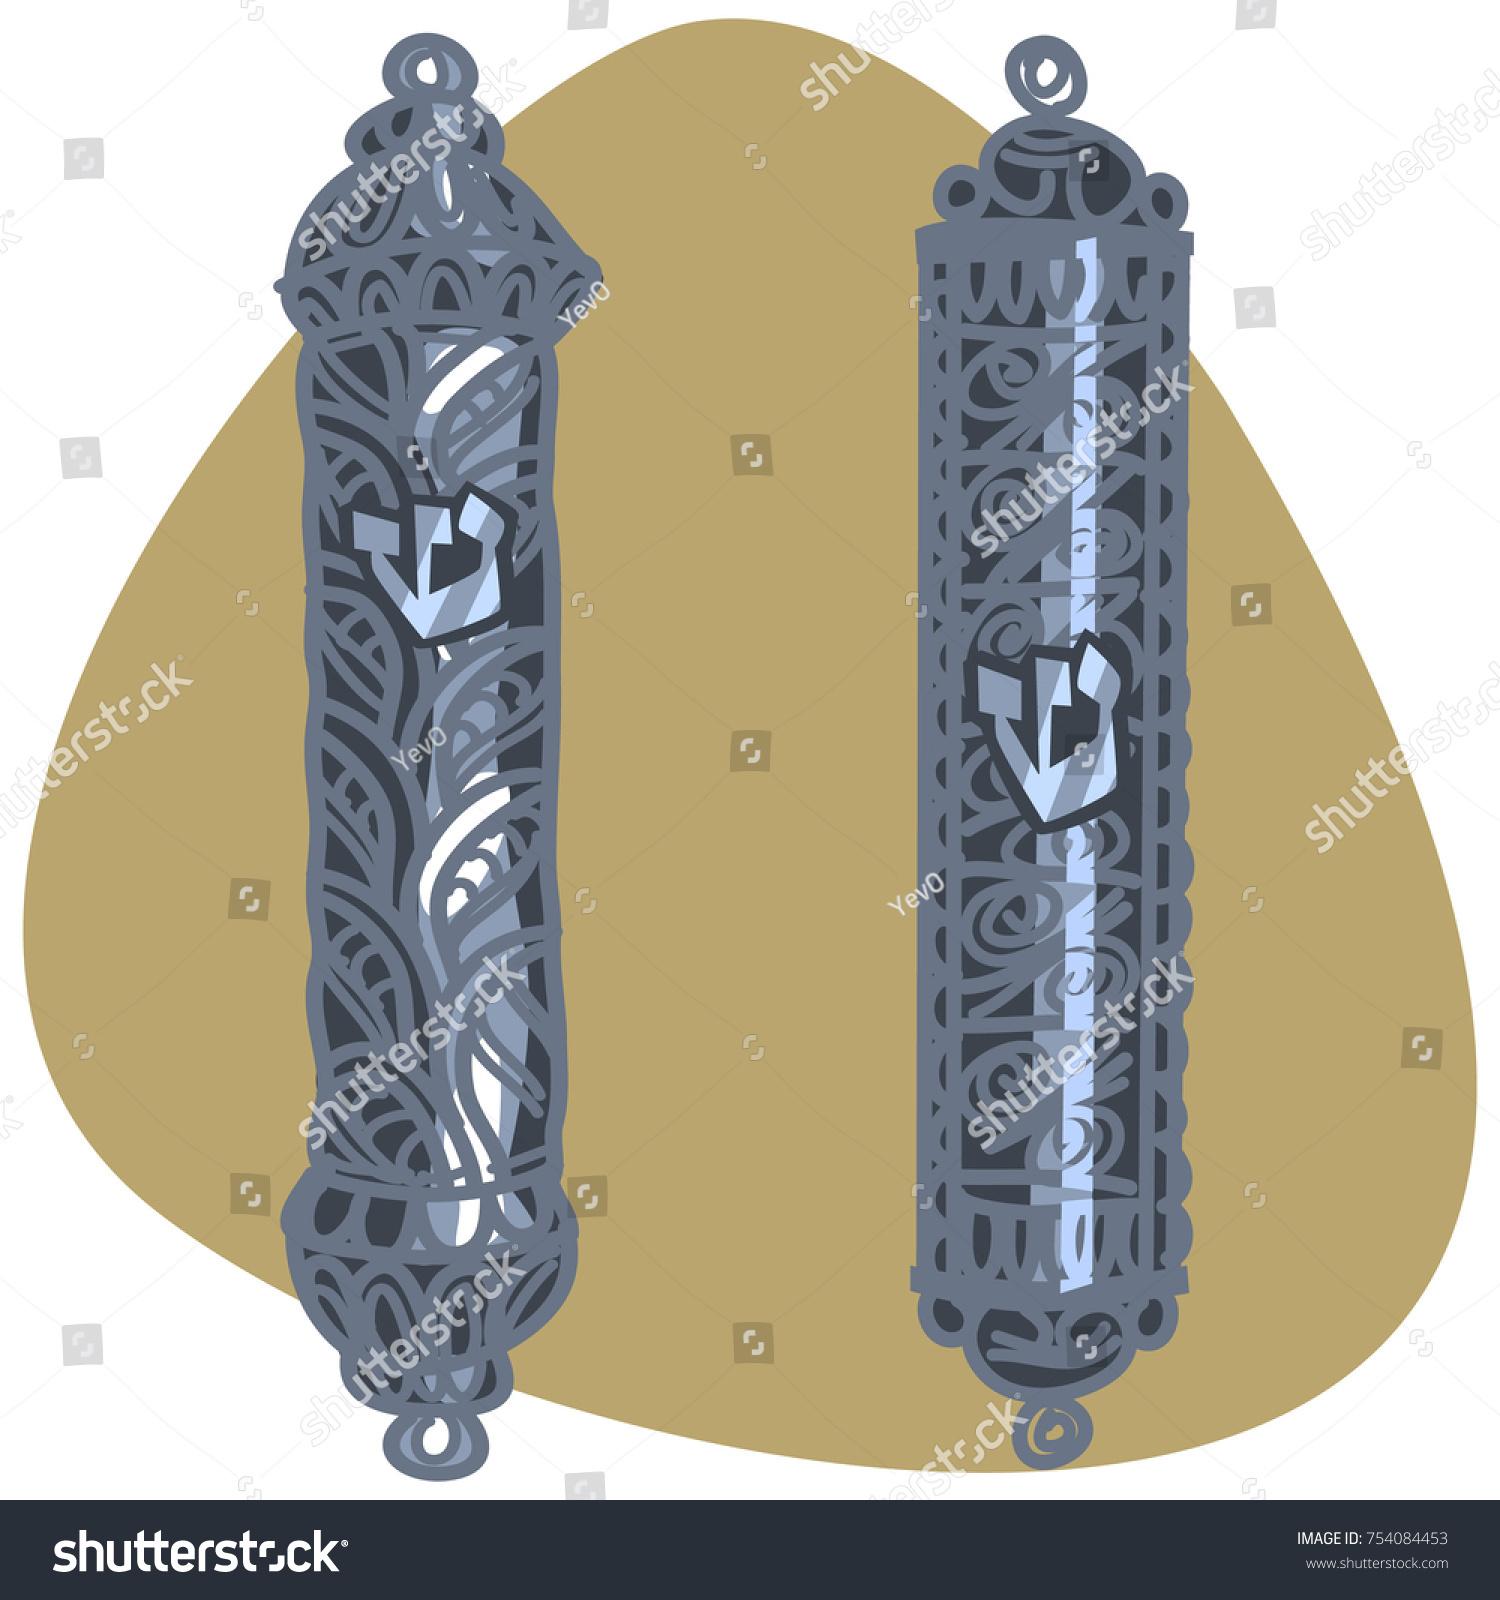 Mezuzah hebrew symbols hebrew letter shin stock vector 754084453 mezuzah with the hebrew symbols the hebrew letter shin for shaddai silver mezuzah case buycottarizona Images